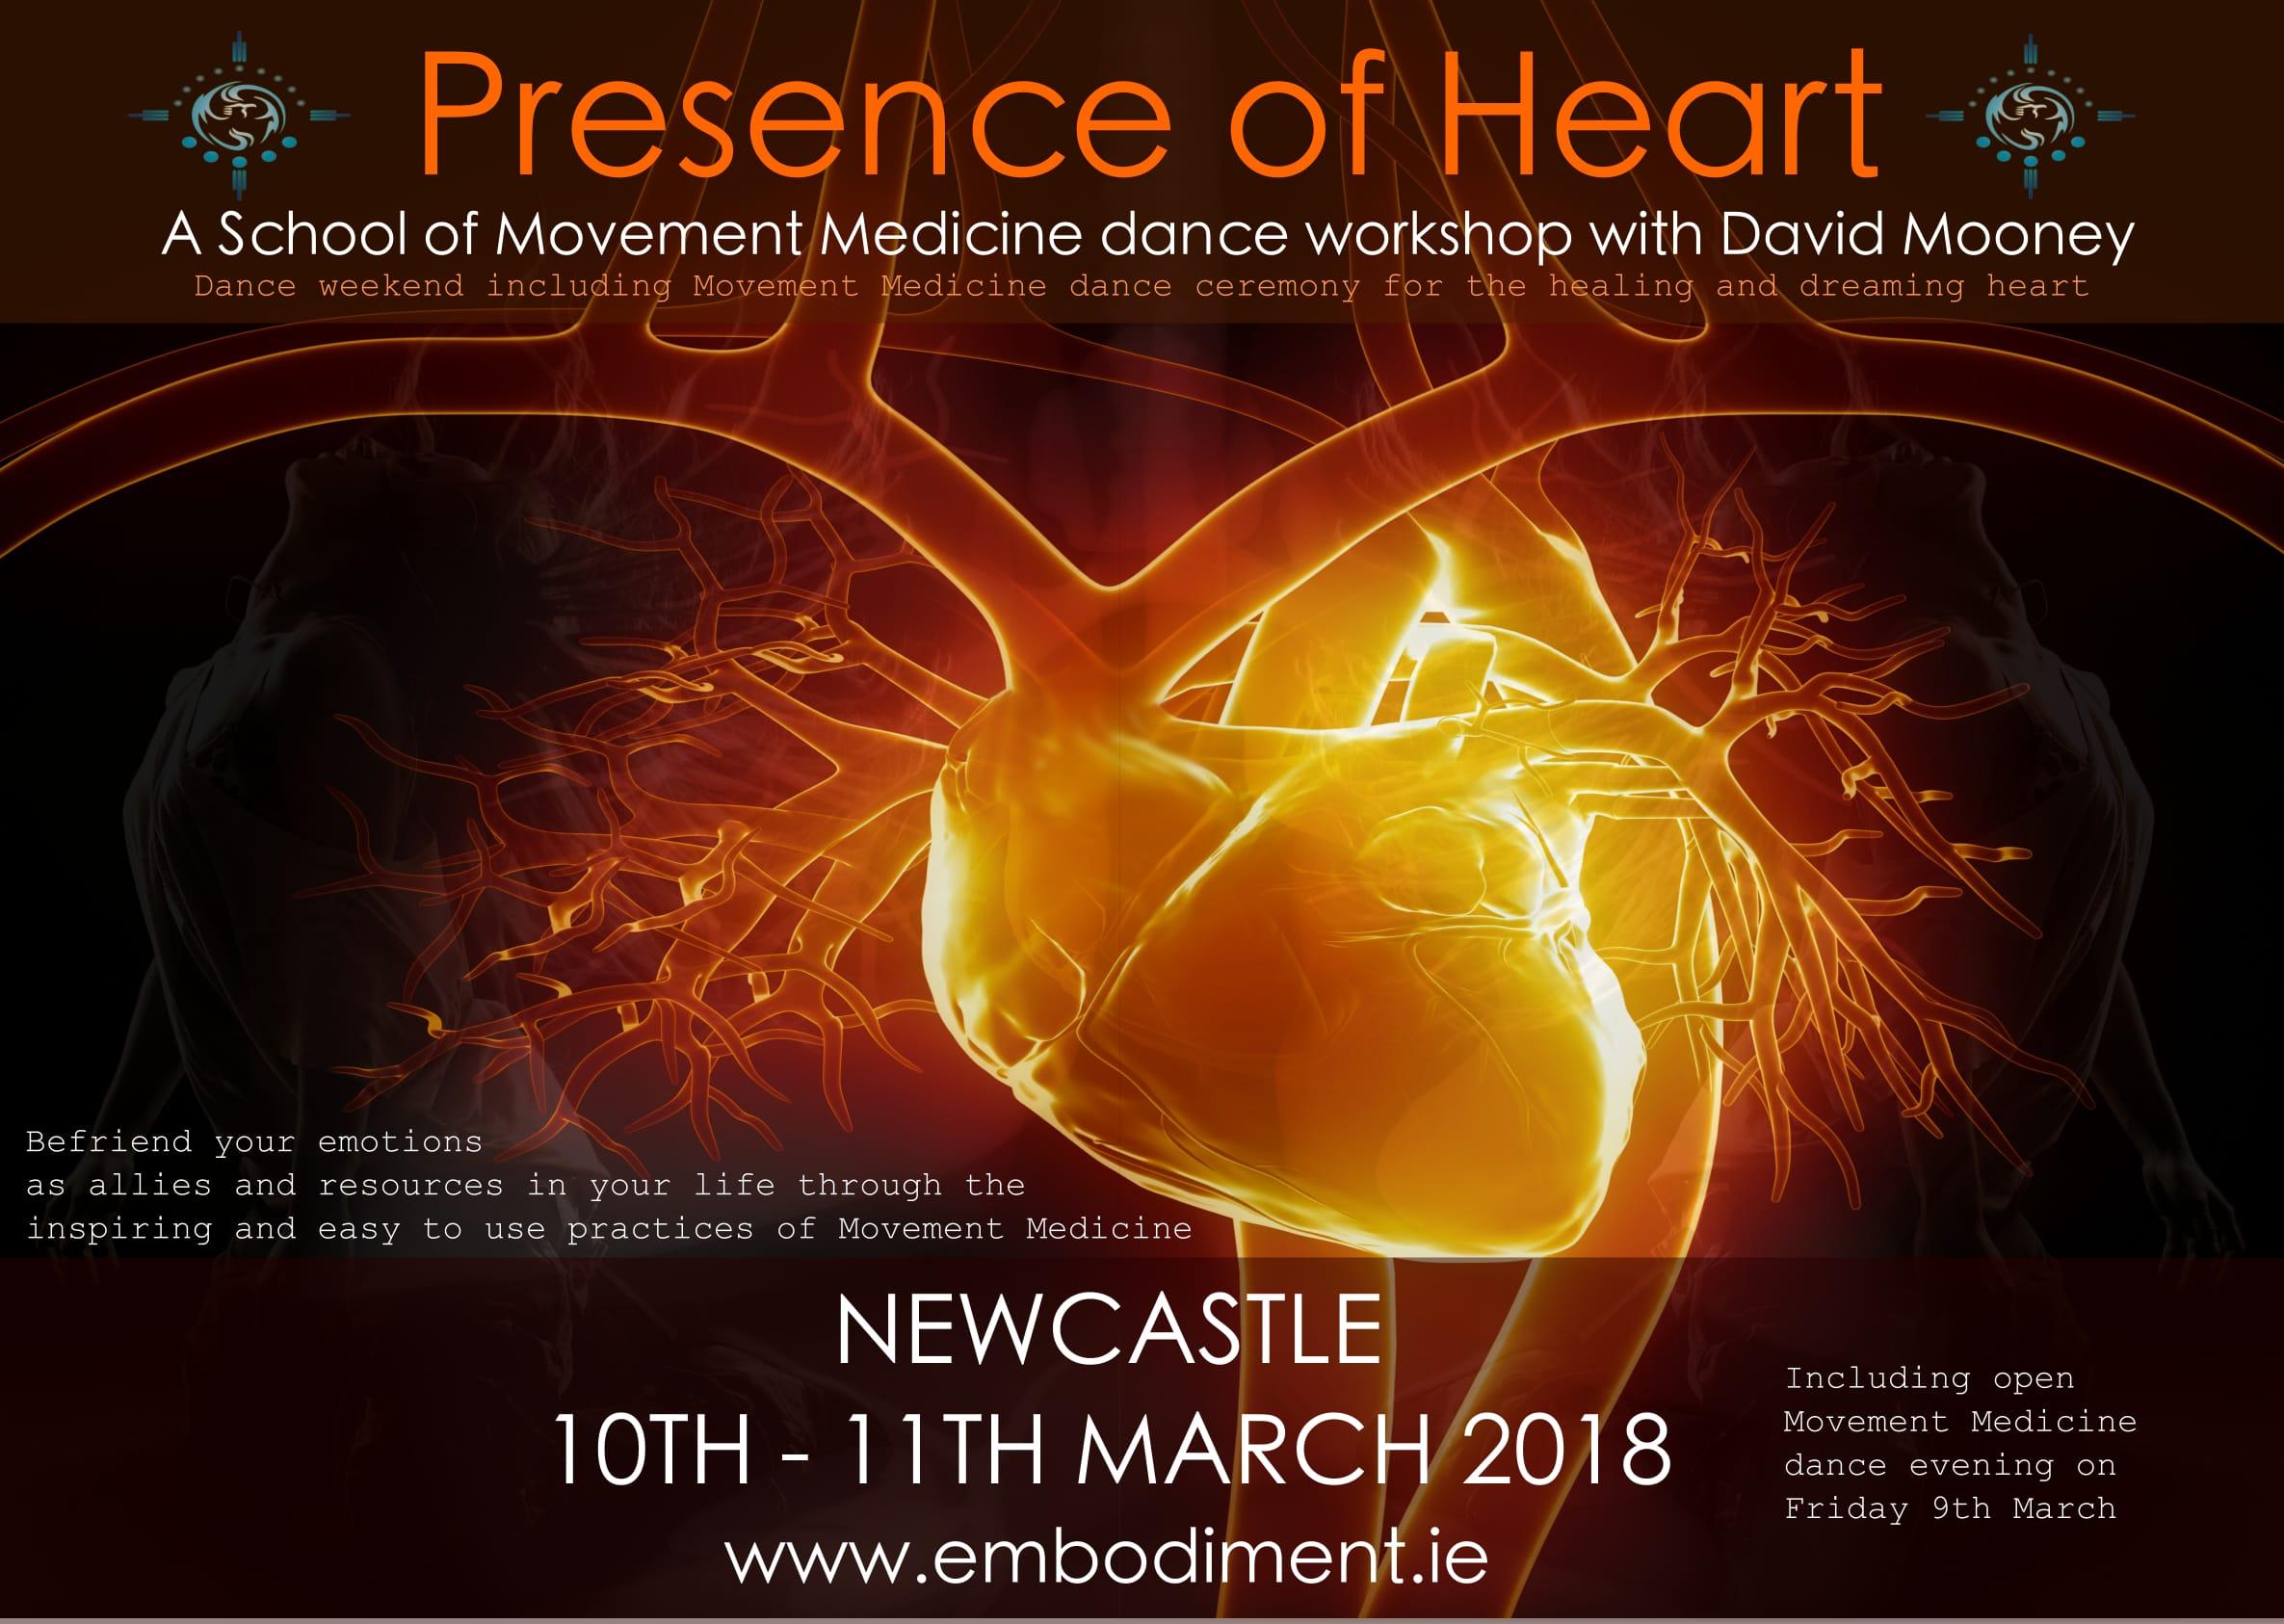 Presence of Heart Newcastle front-1 copy.jpg